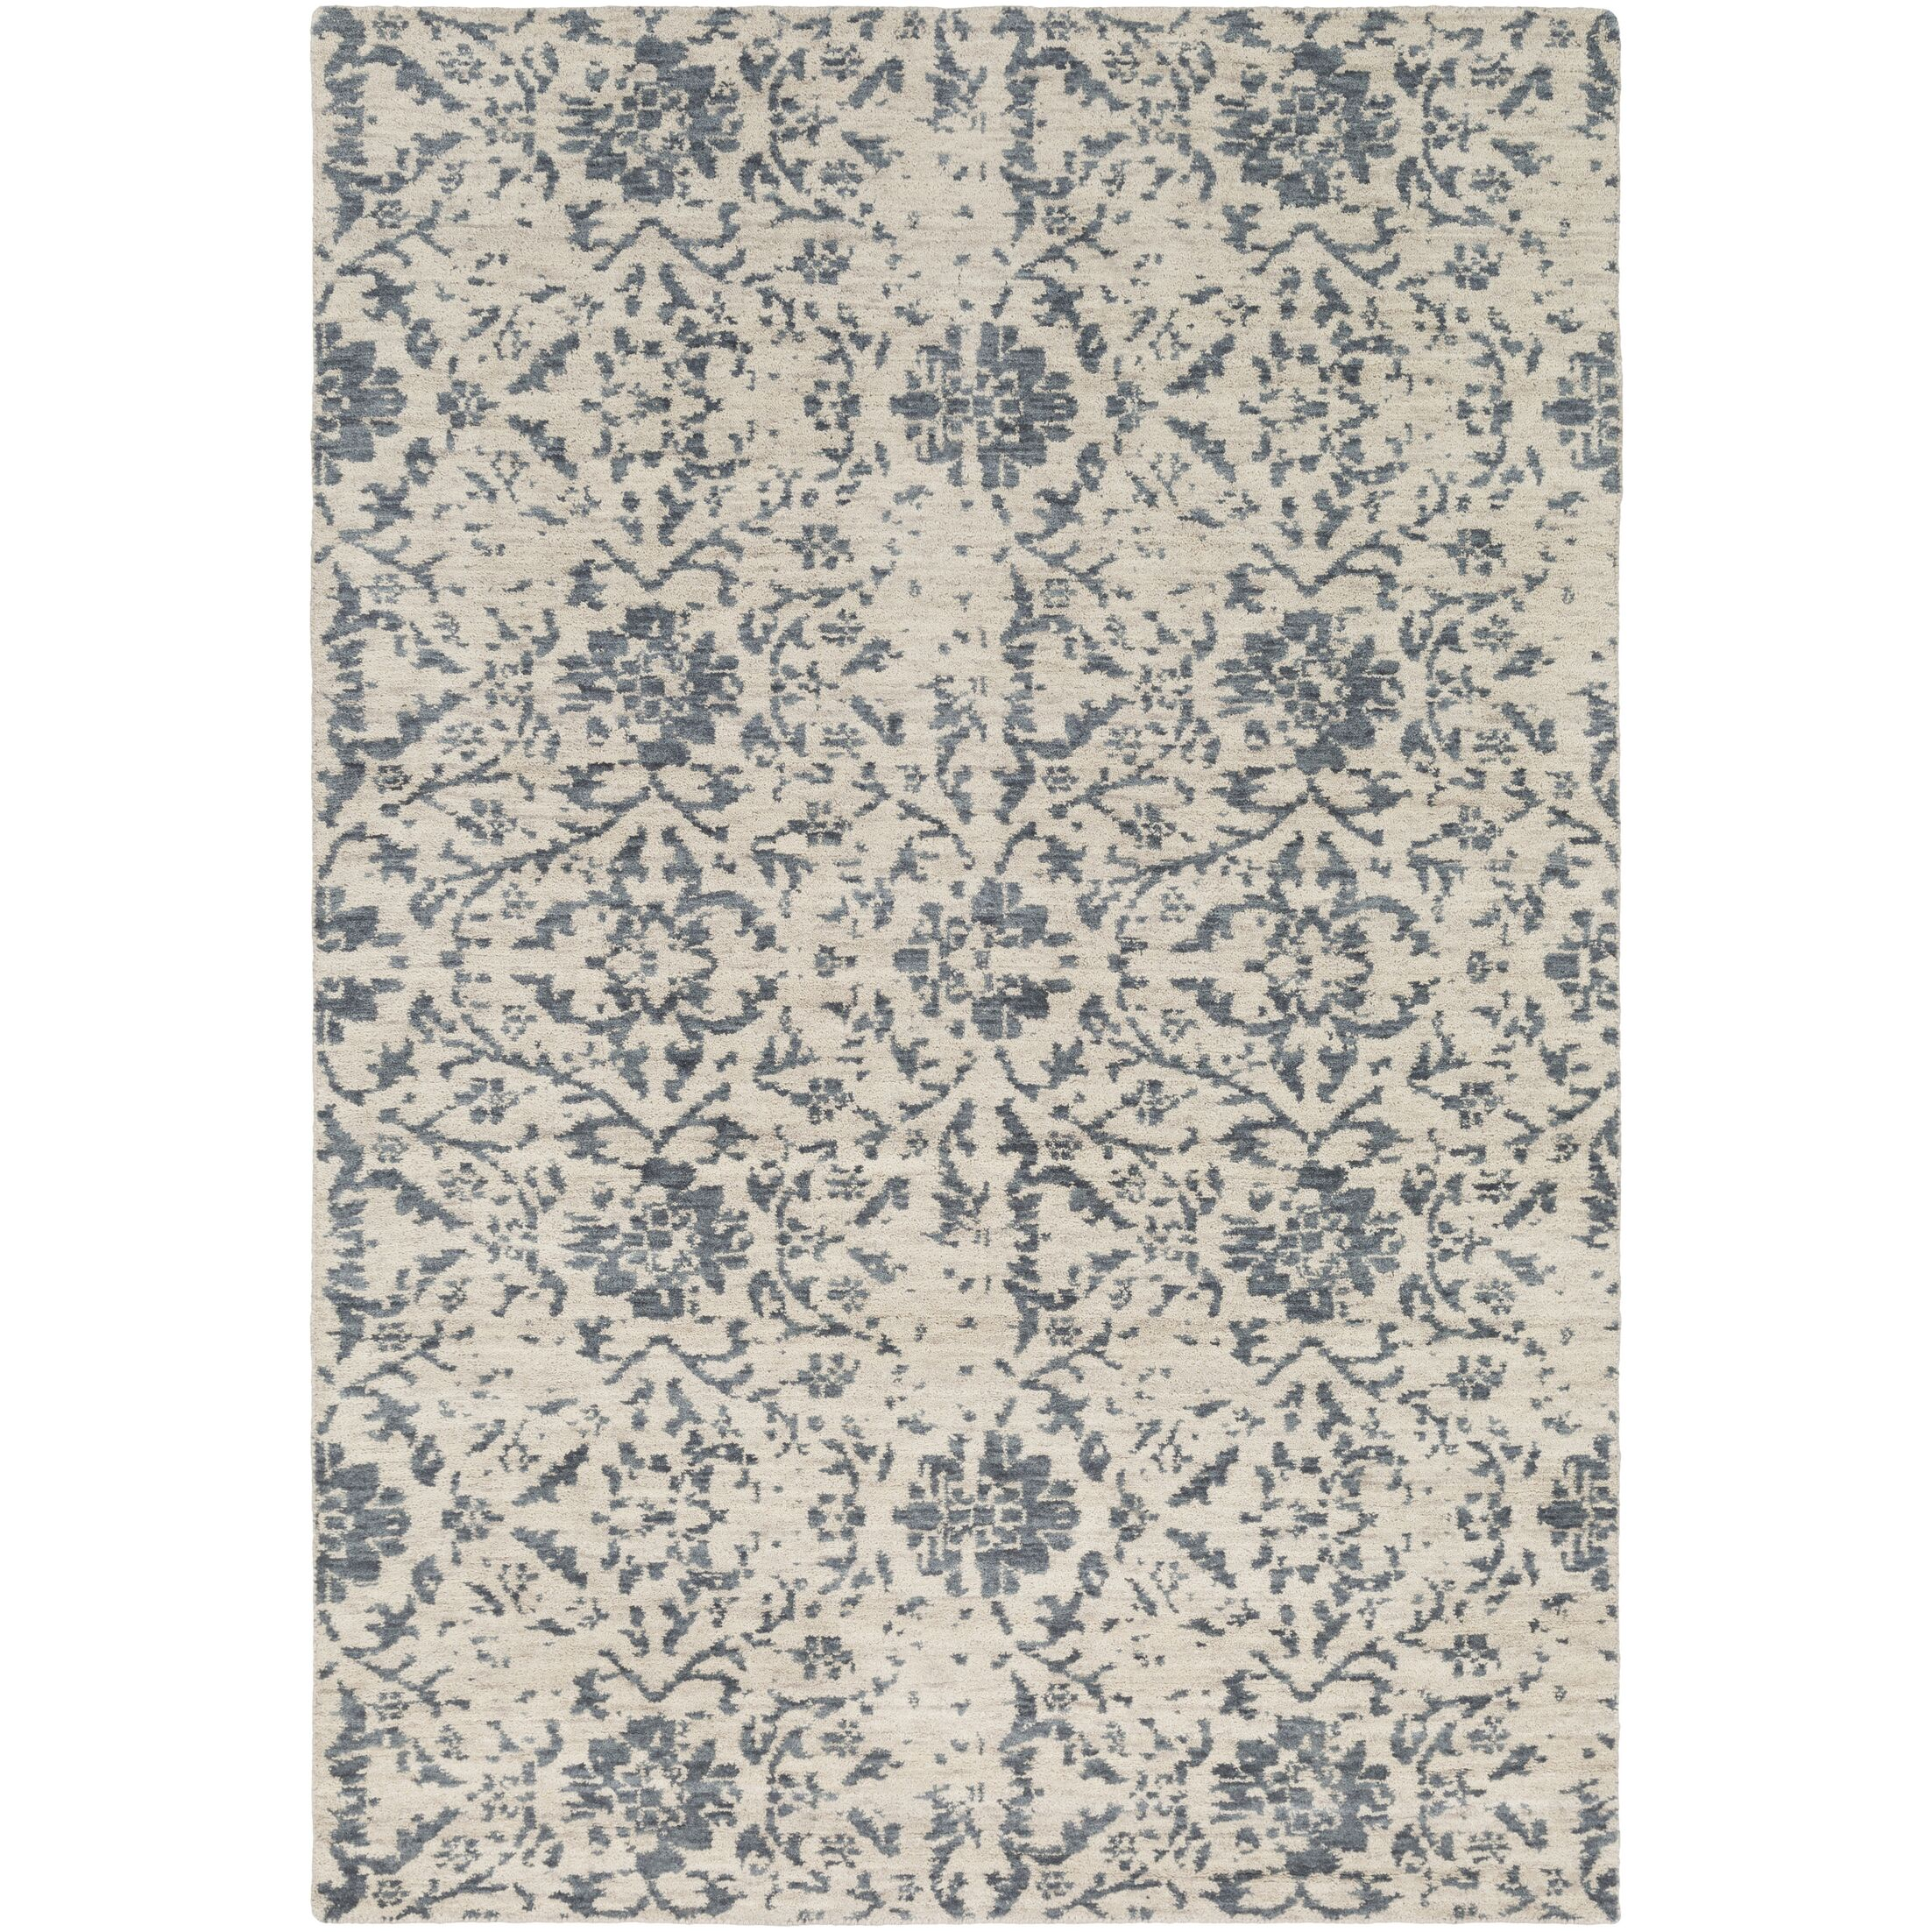 Ashton Hand-Knotted Denim/Khaki Area Rug Rug Size: Rectangle 2' x 3'